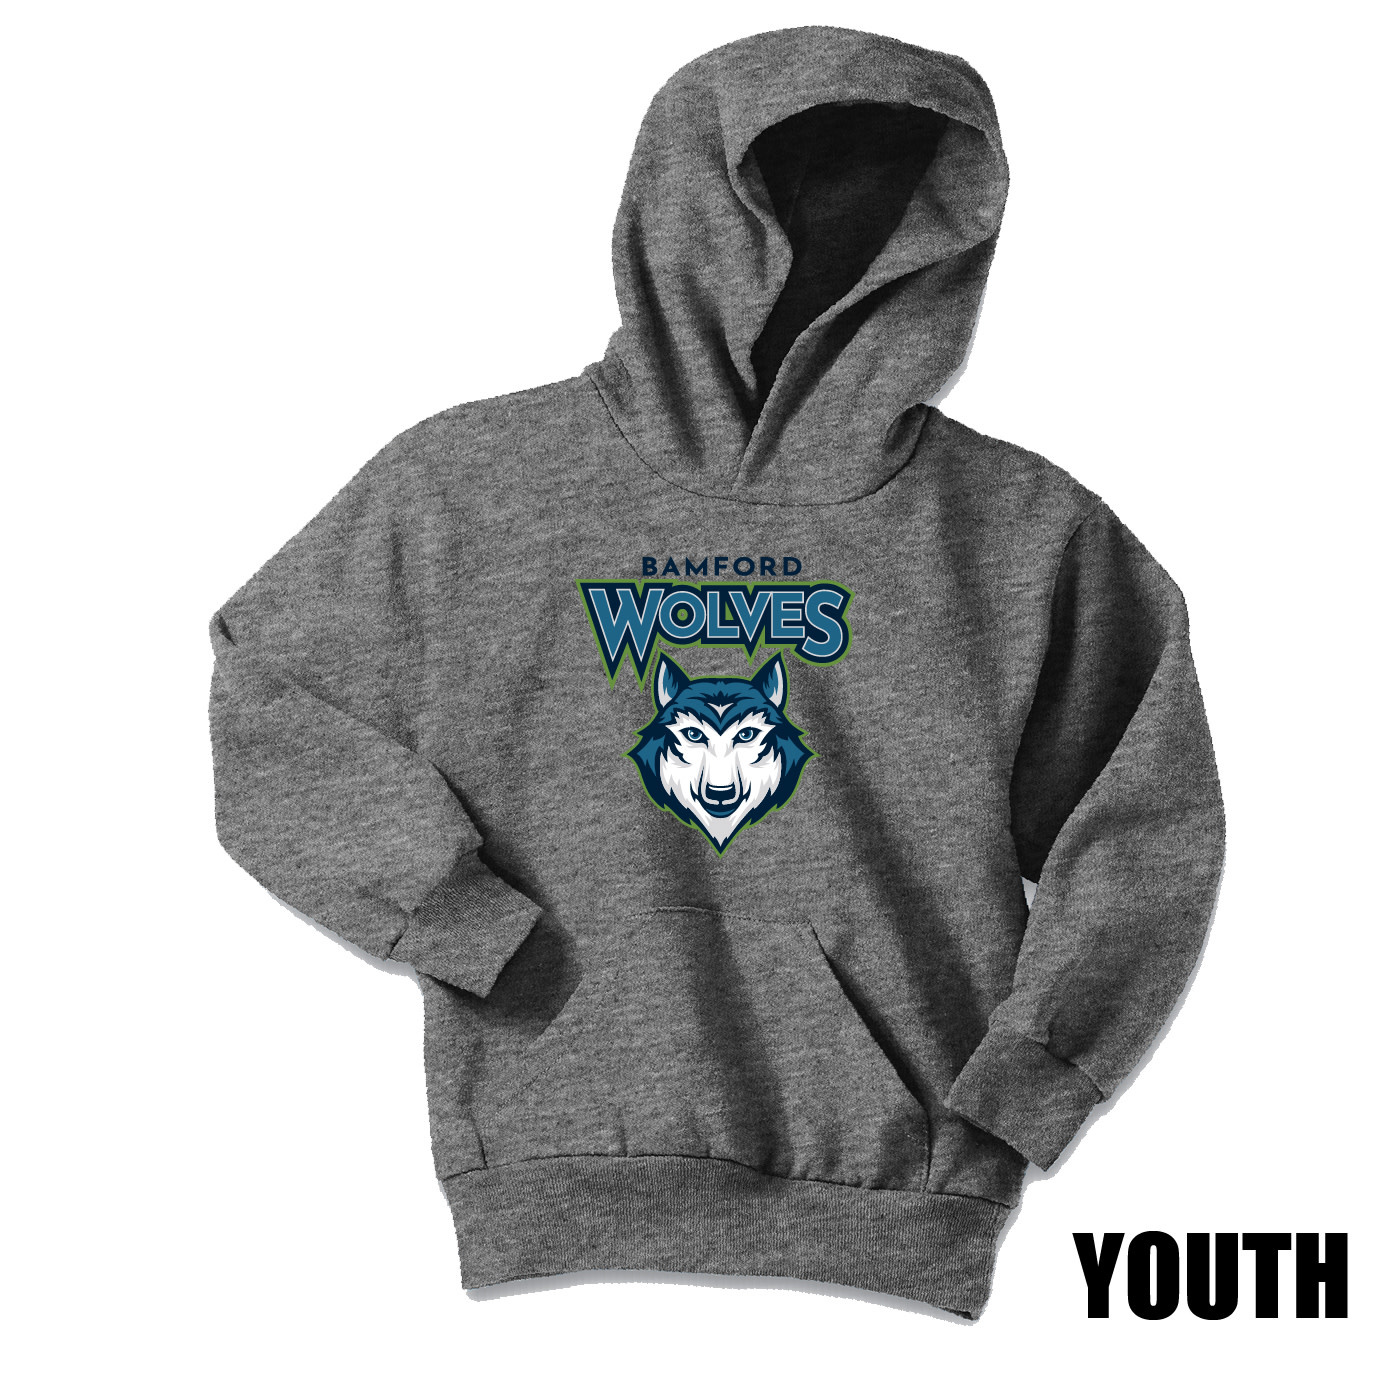 Port Authority Port & Company Youth Core Fleece Pullover Hooded Sweatshirt (Graphite Heather)